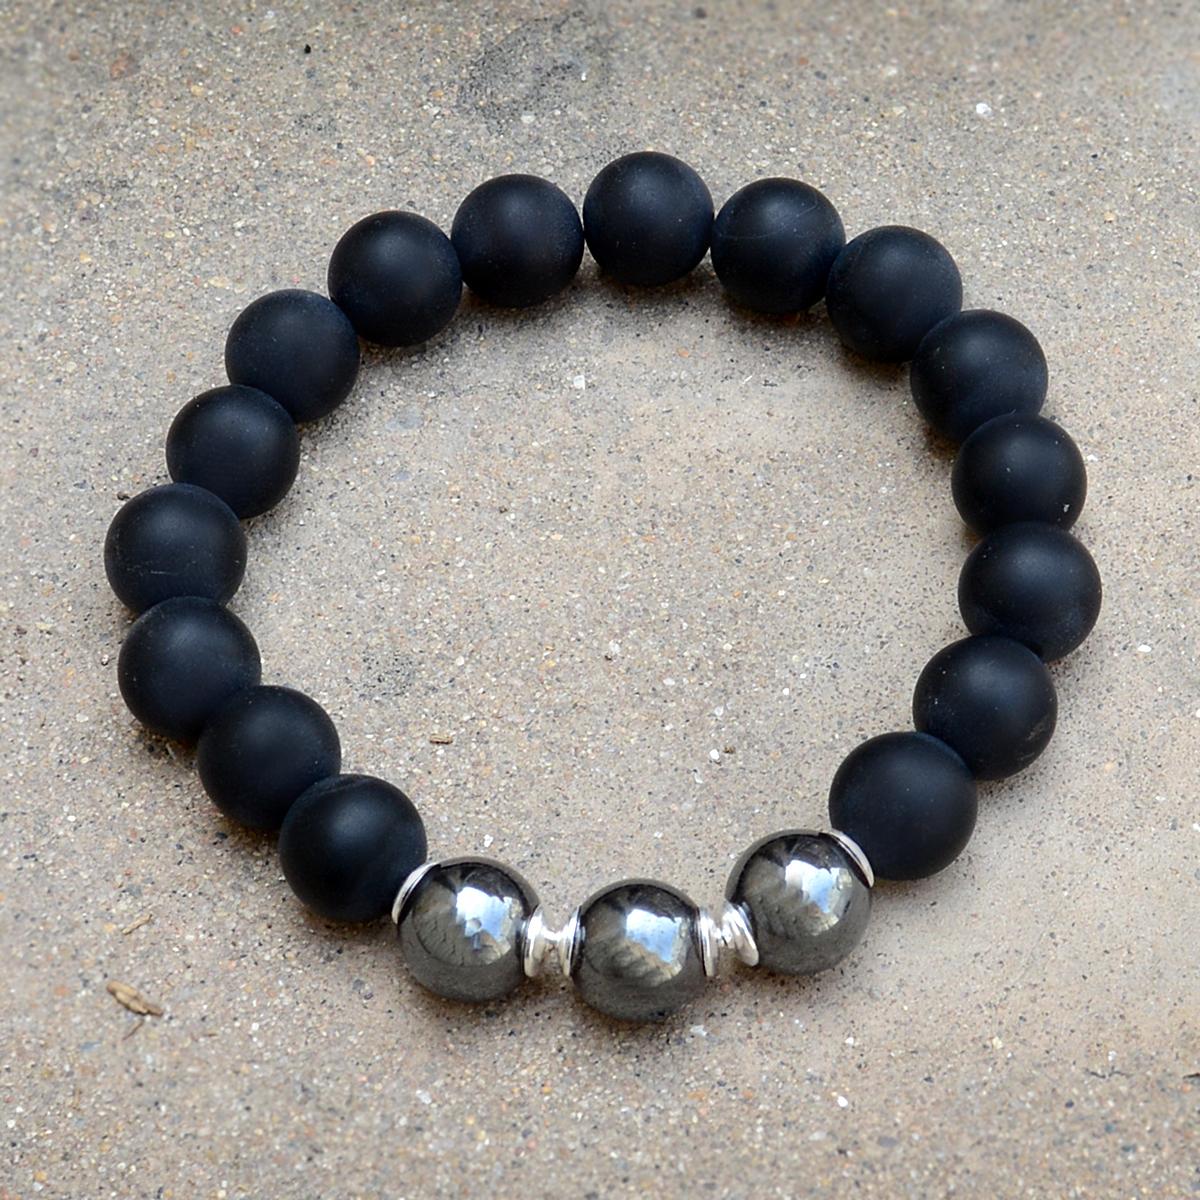 Matte Onyx & Hematite Handmade Jewelry Manufacturer 925 Sterling Silver Stretchable Jaipur Rajasthan India Beaded Bracelet